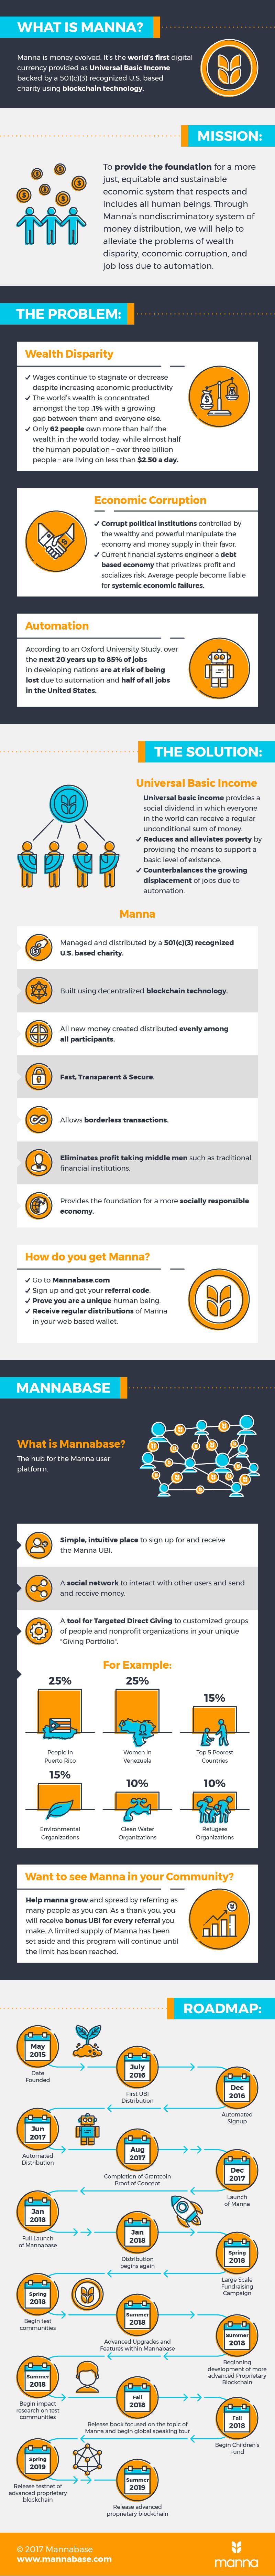 Mannabase Universal Basic Income Blockchain Steemit Blockchain Income Basic